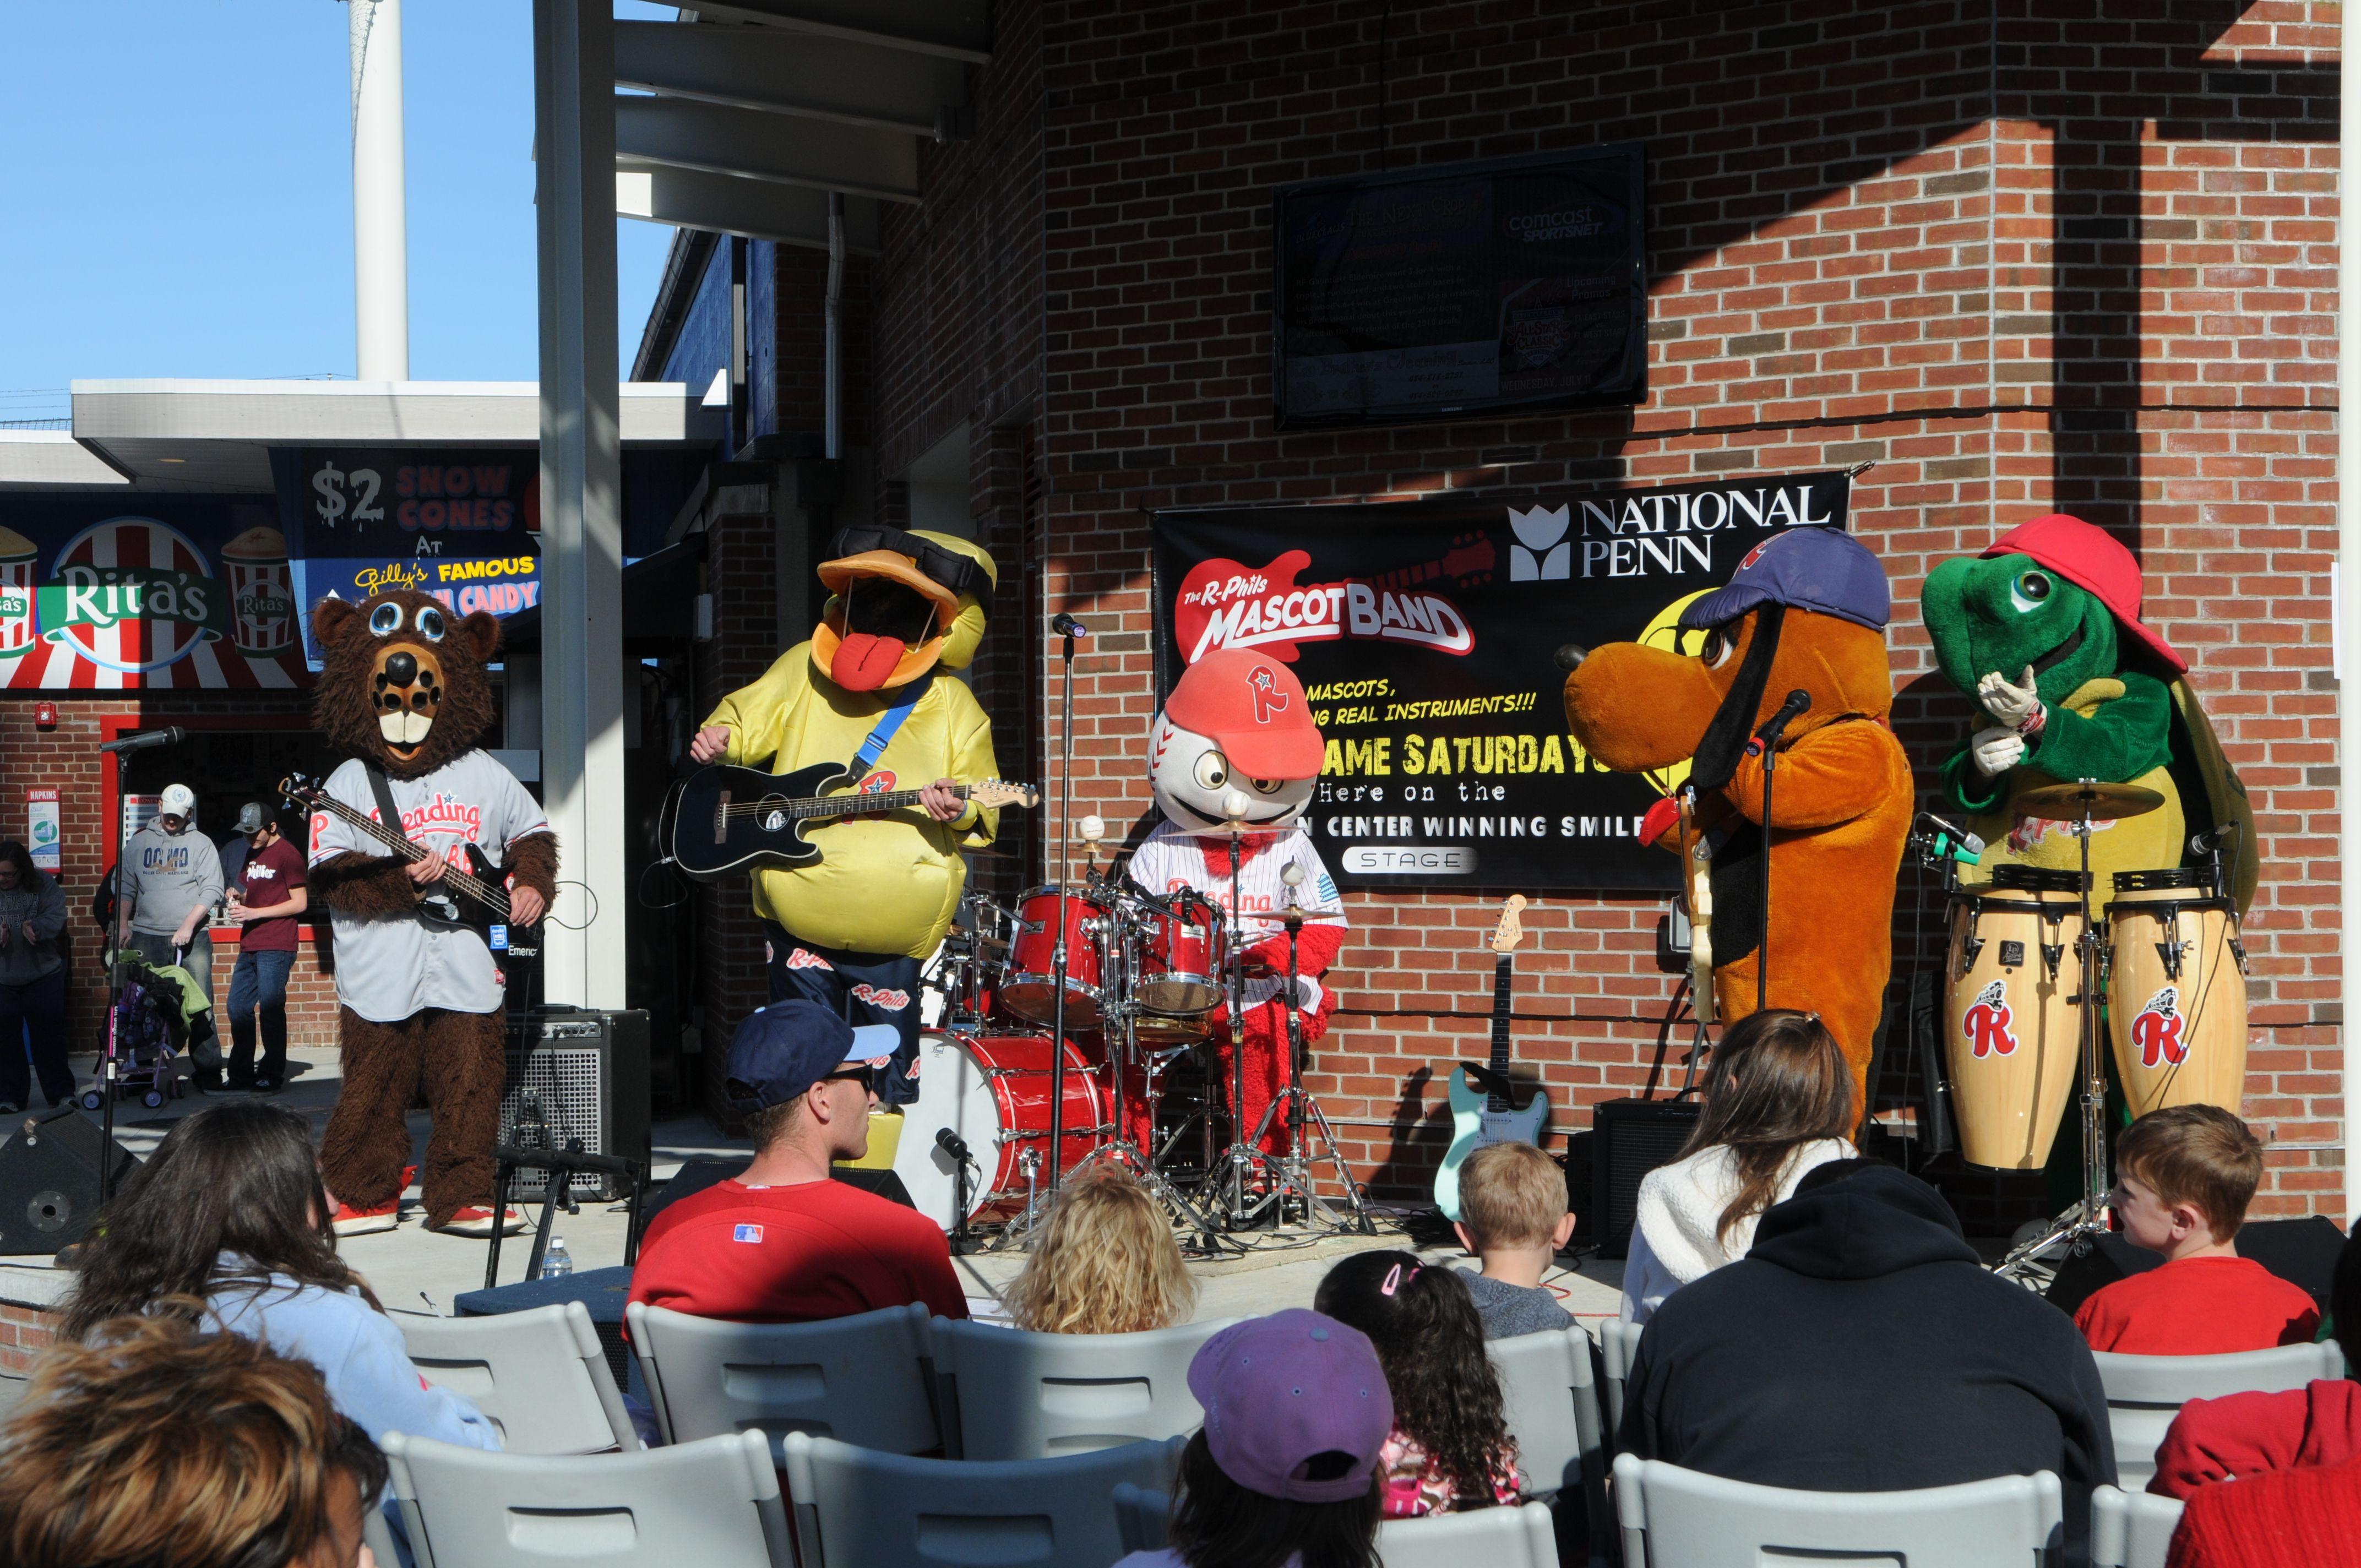 National Penn Bank Reading Phillies Mascot Band